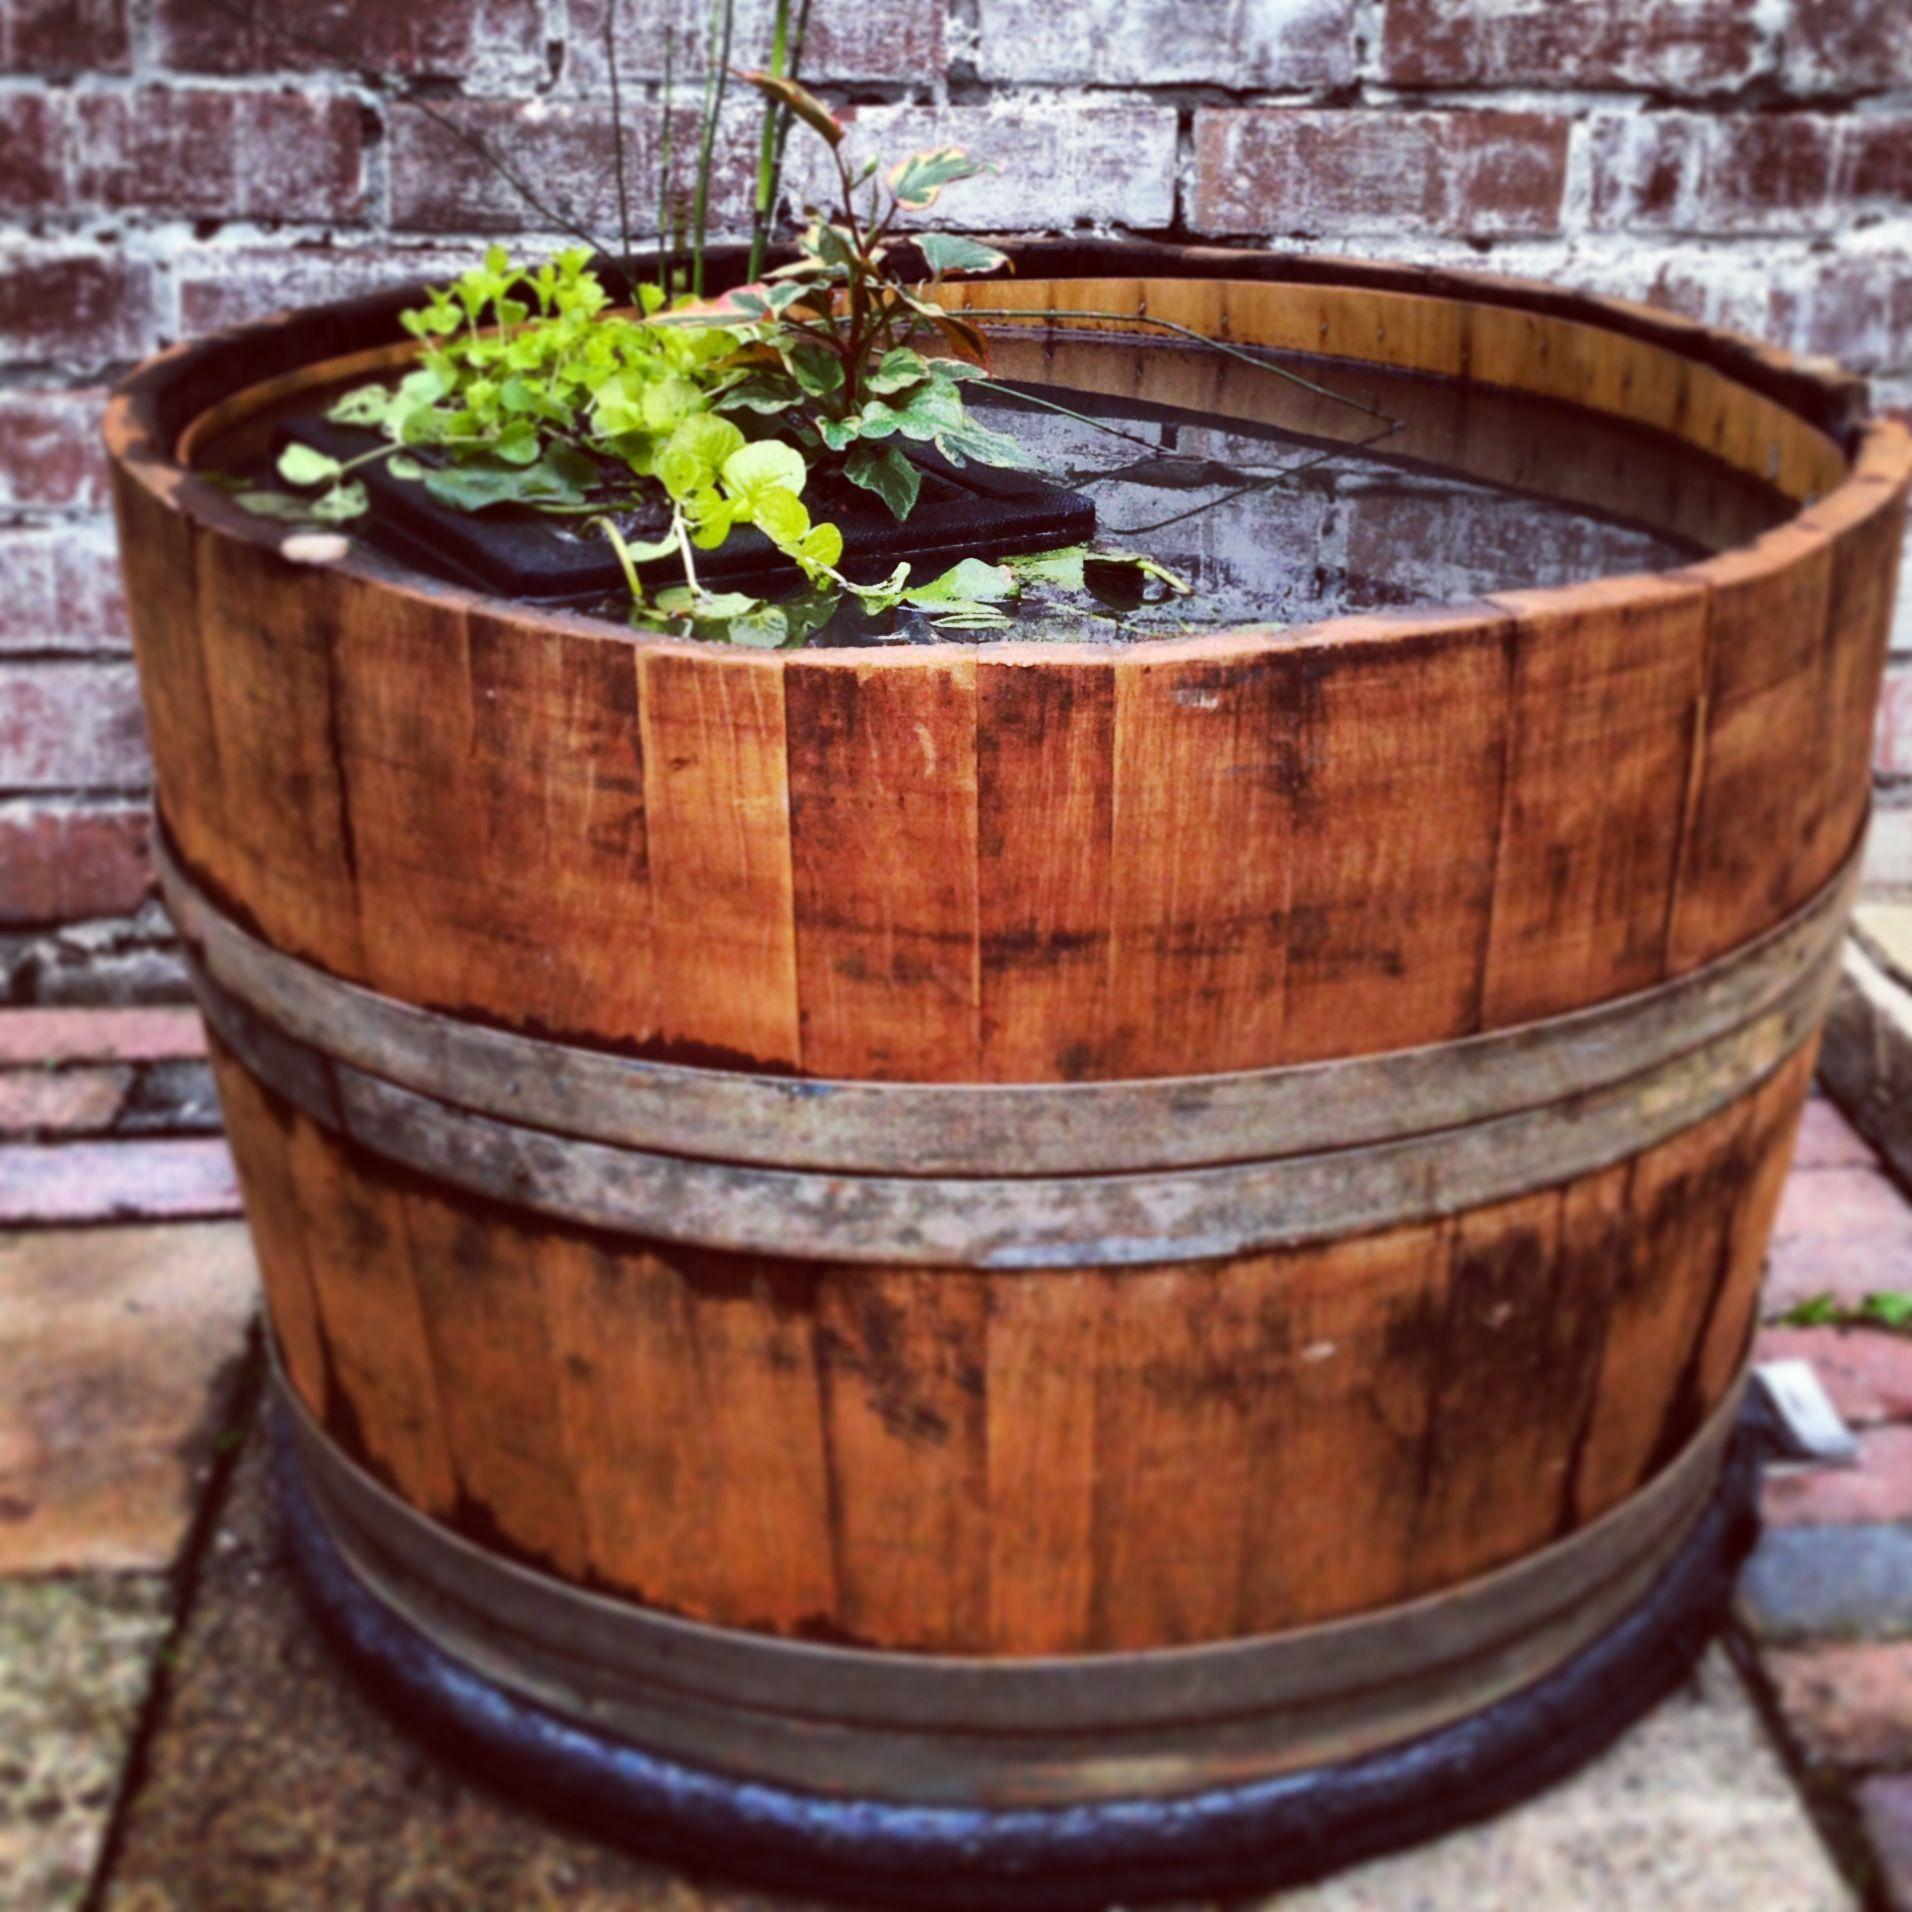 Half Whiskey Barrel Pond Fish Pond Wooden Barrel Wine Barrel